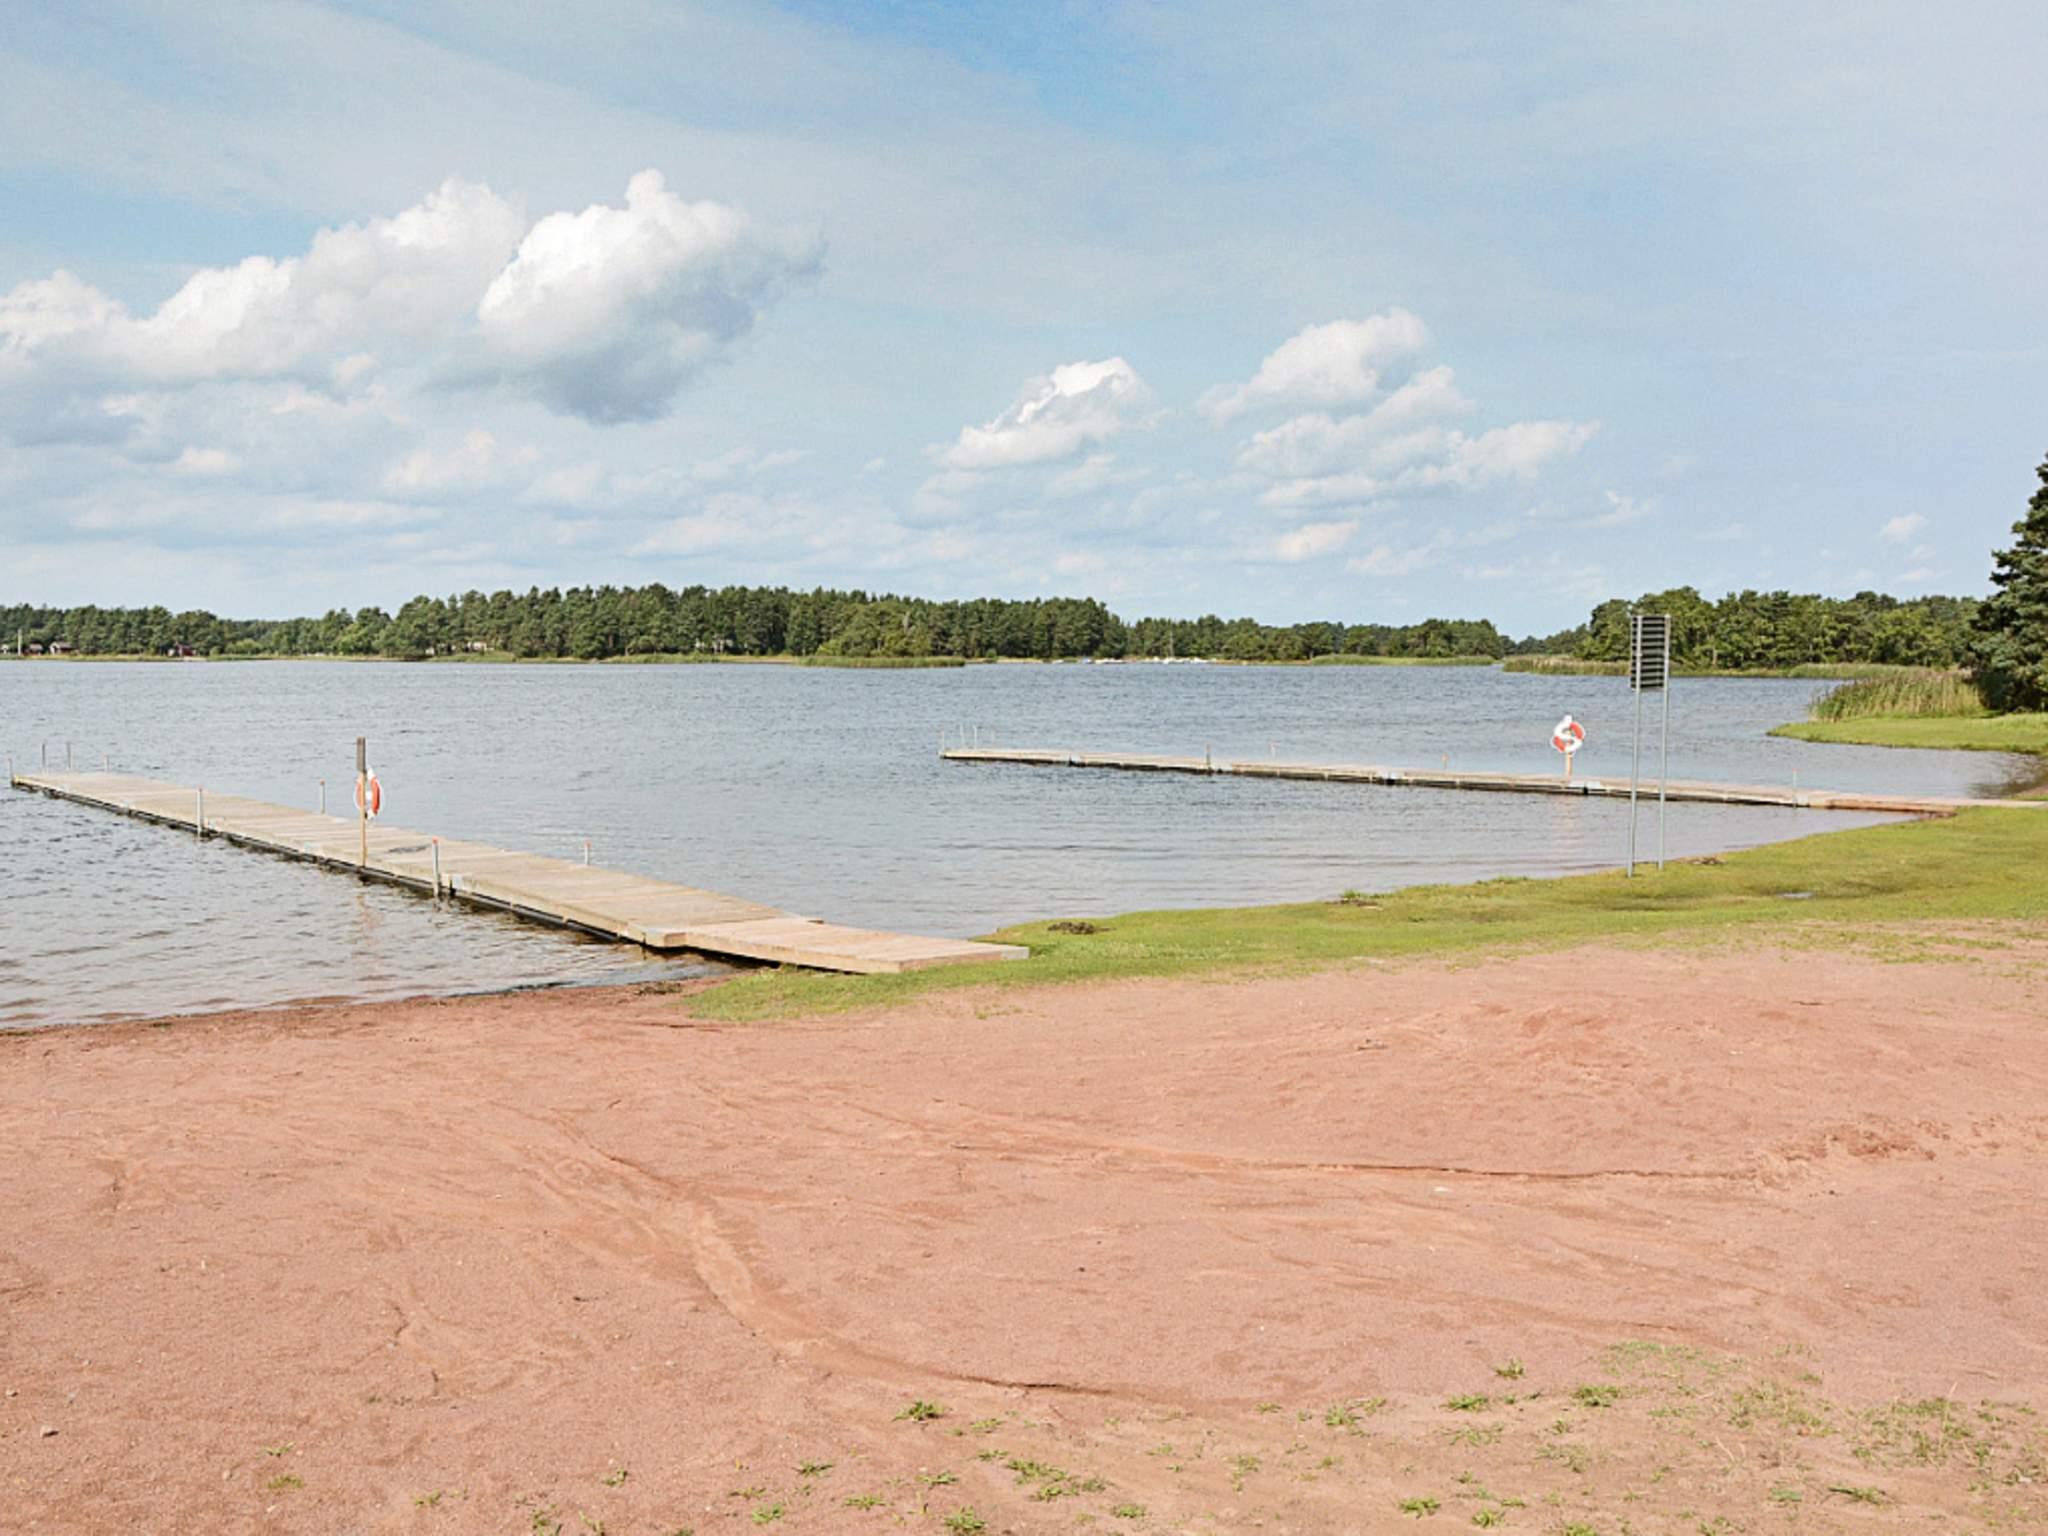 Ferienhaus Oknö (84699), Oknö, Kalmar län, Südschweden, Schweden, Bild 9